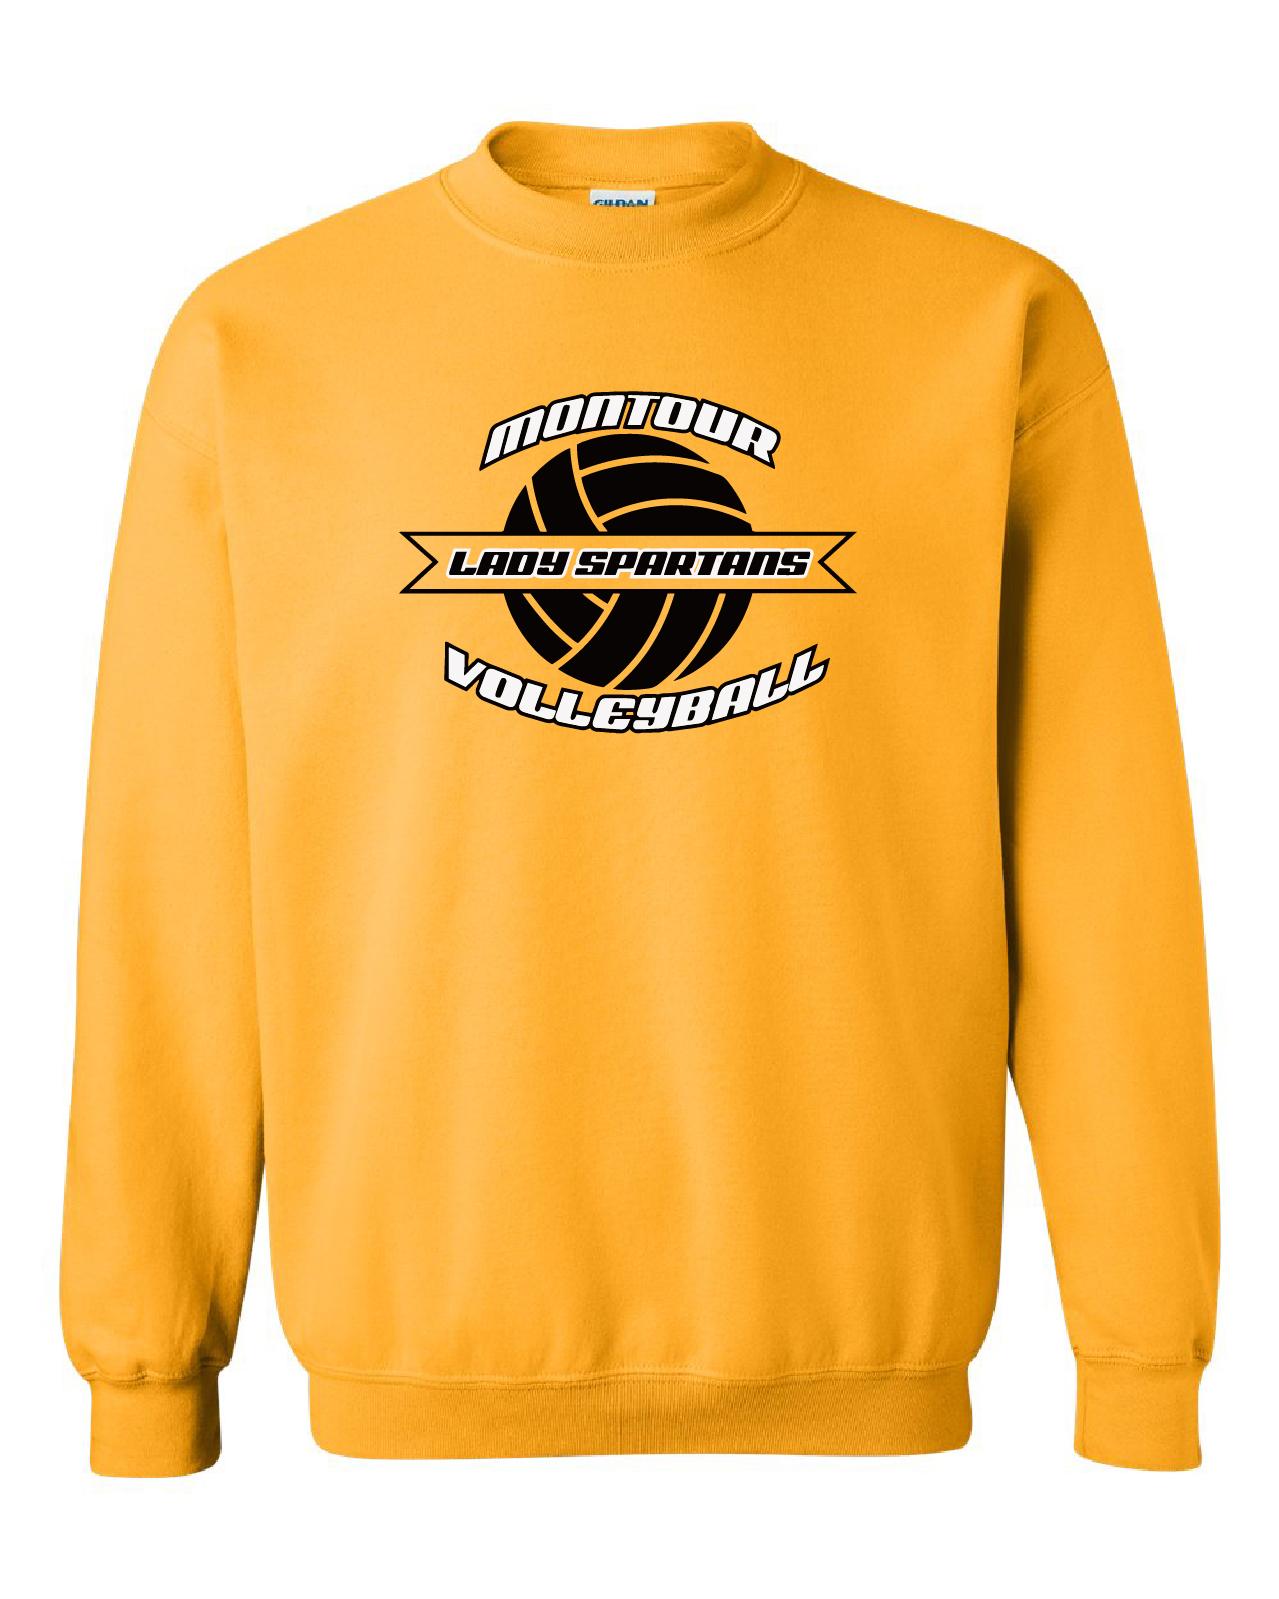 Gildan – Heavy Blend Crewneck Sweatshirt DESIGN B